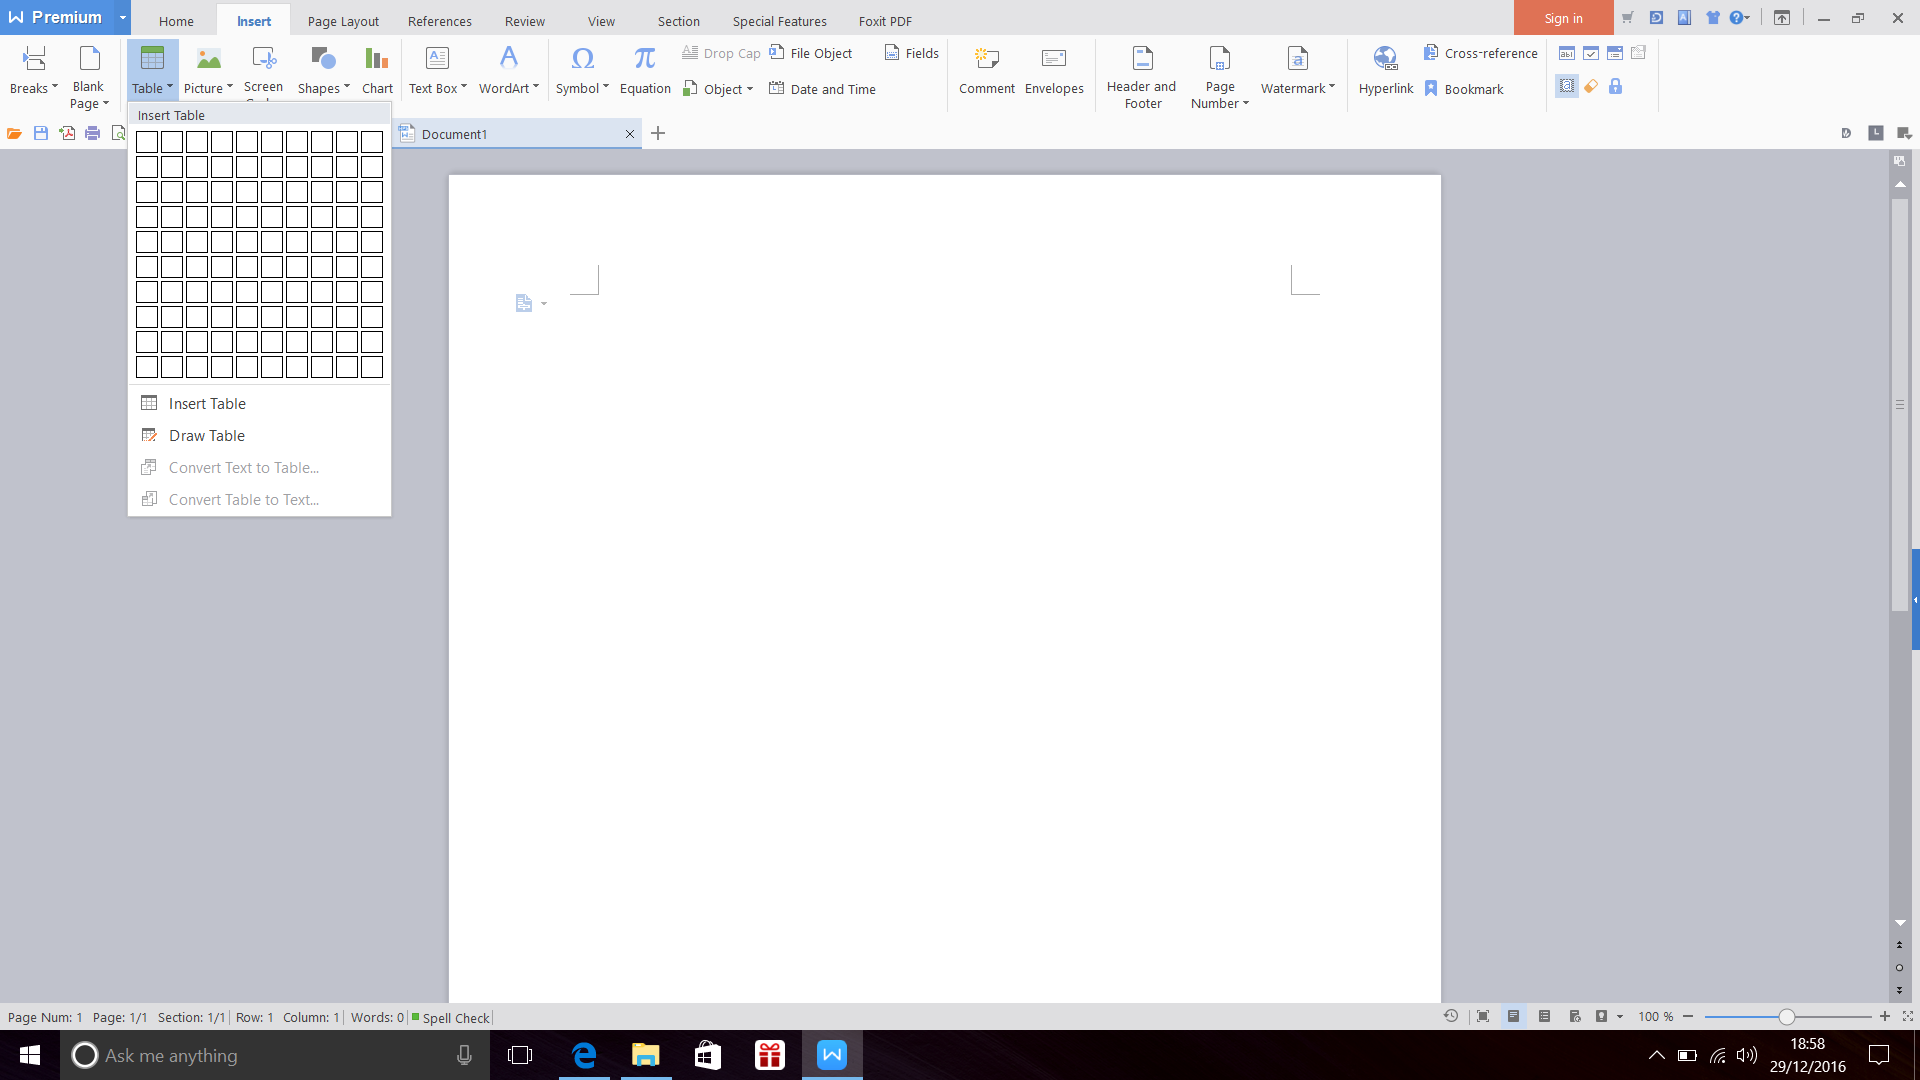 Screenshot of Insert Table in WPS Office 2016 Writer (Windows 10